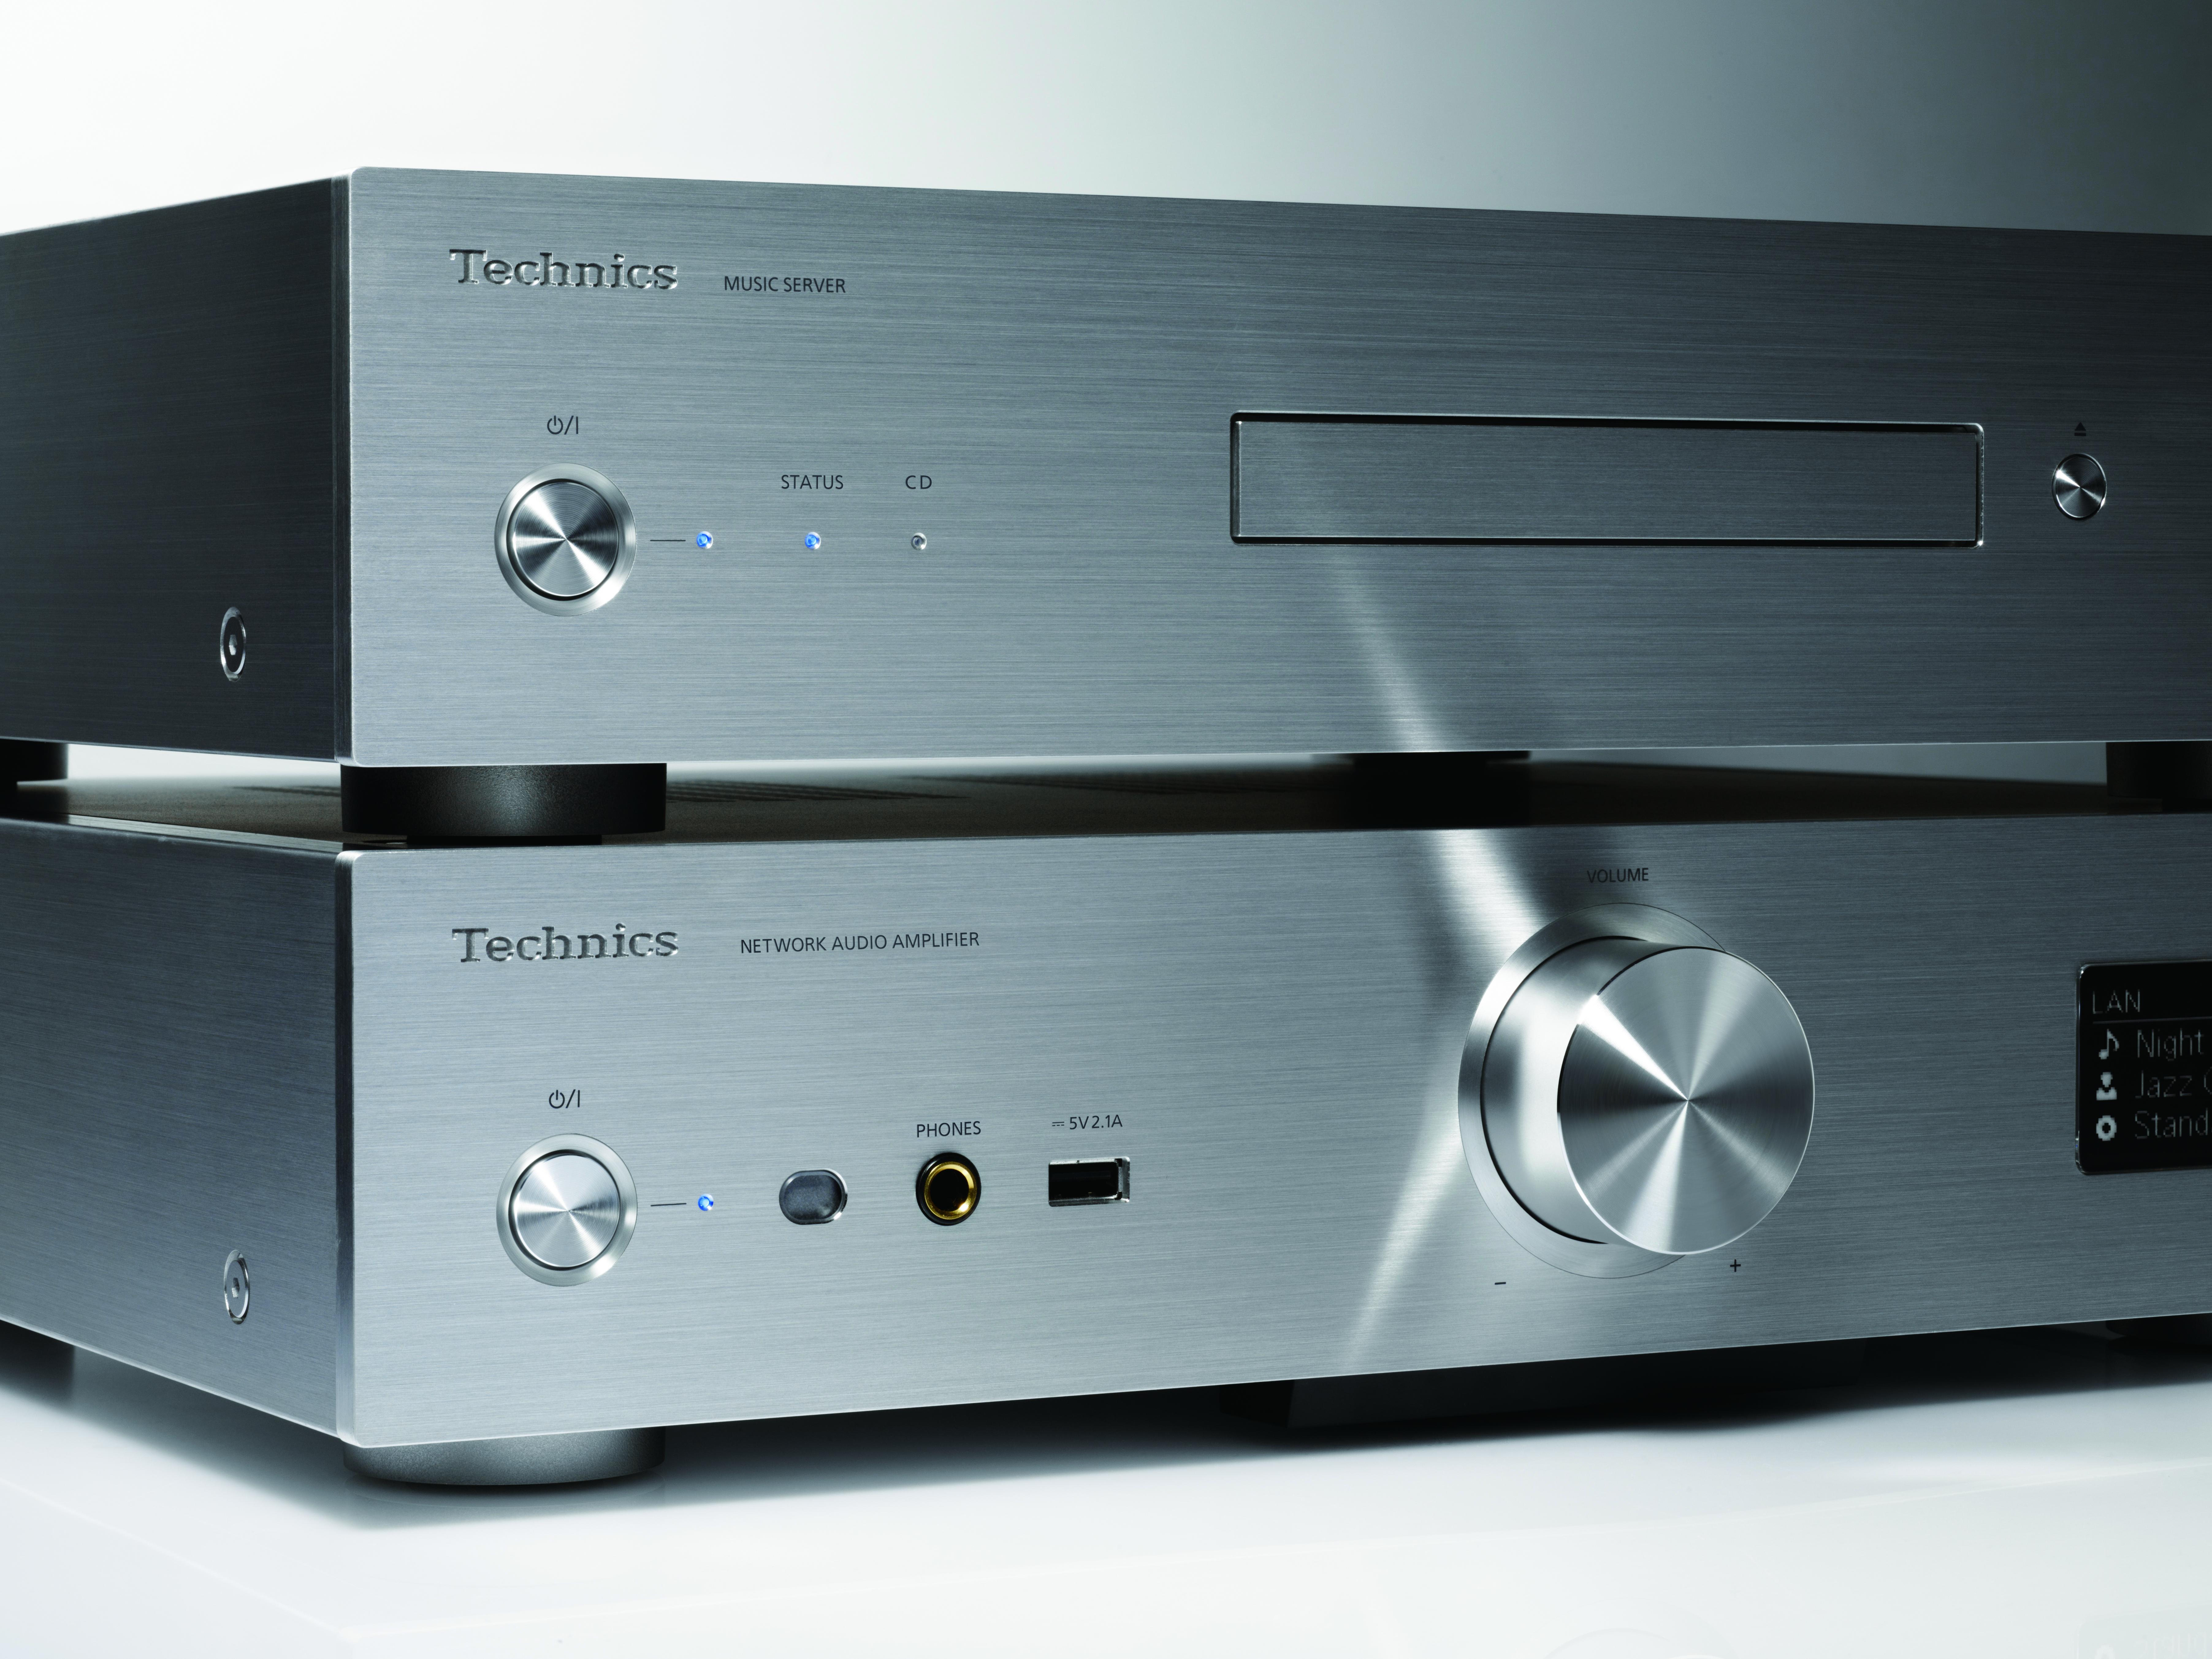 Technics Grand Class G30 hi-fi system with media server press image courtesy of Panasonic